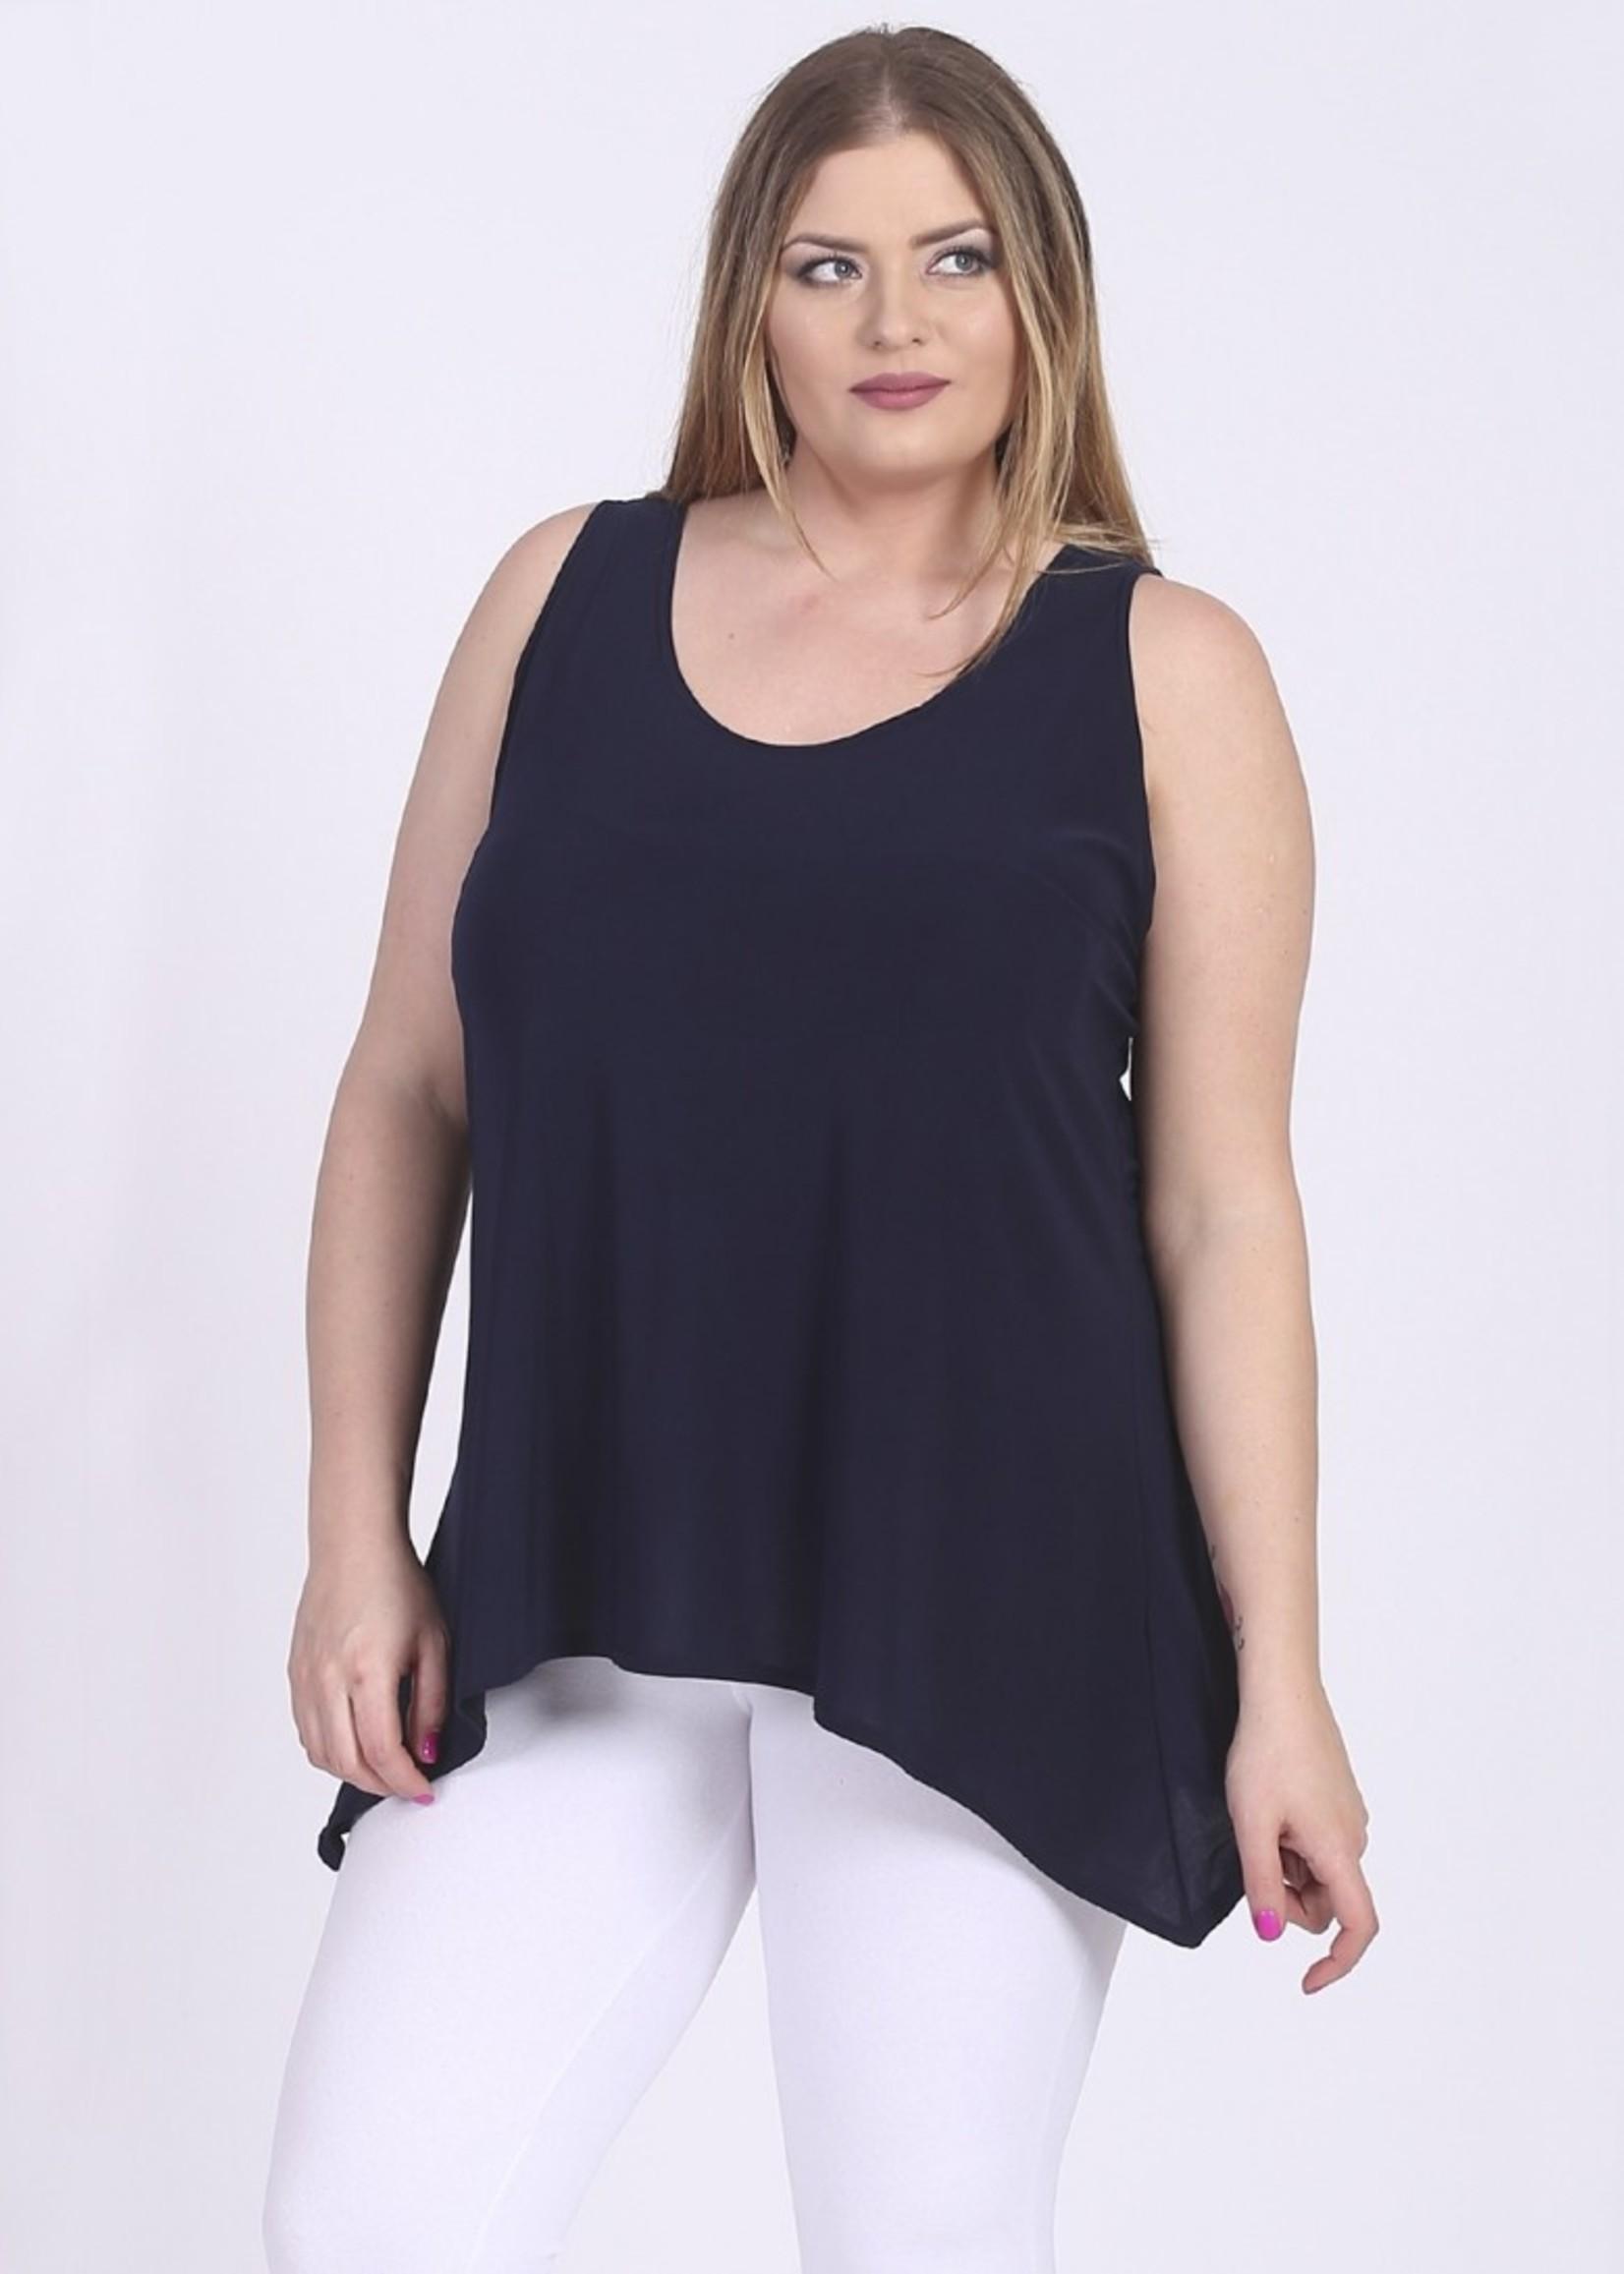 Magna Fashion Top A26 SOLID BASIS